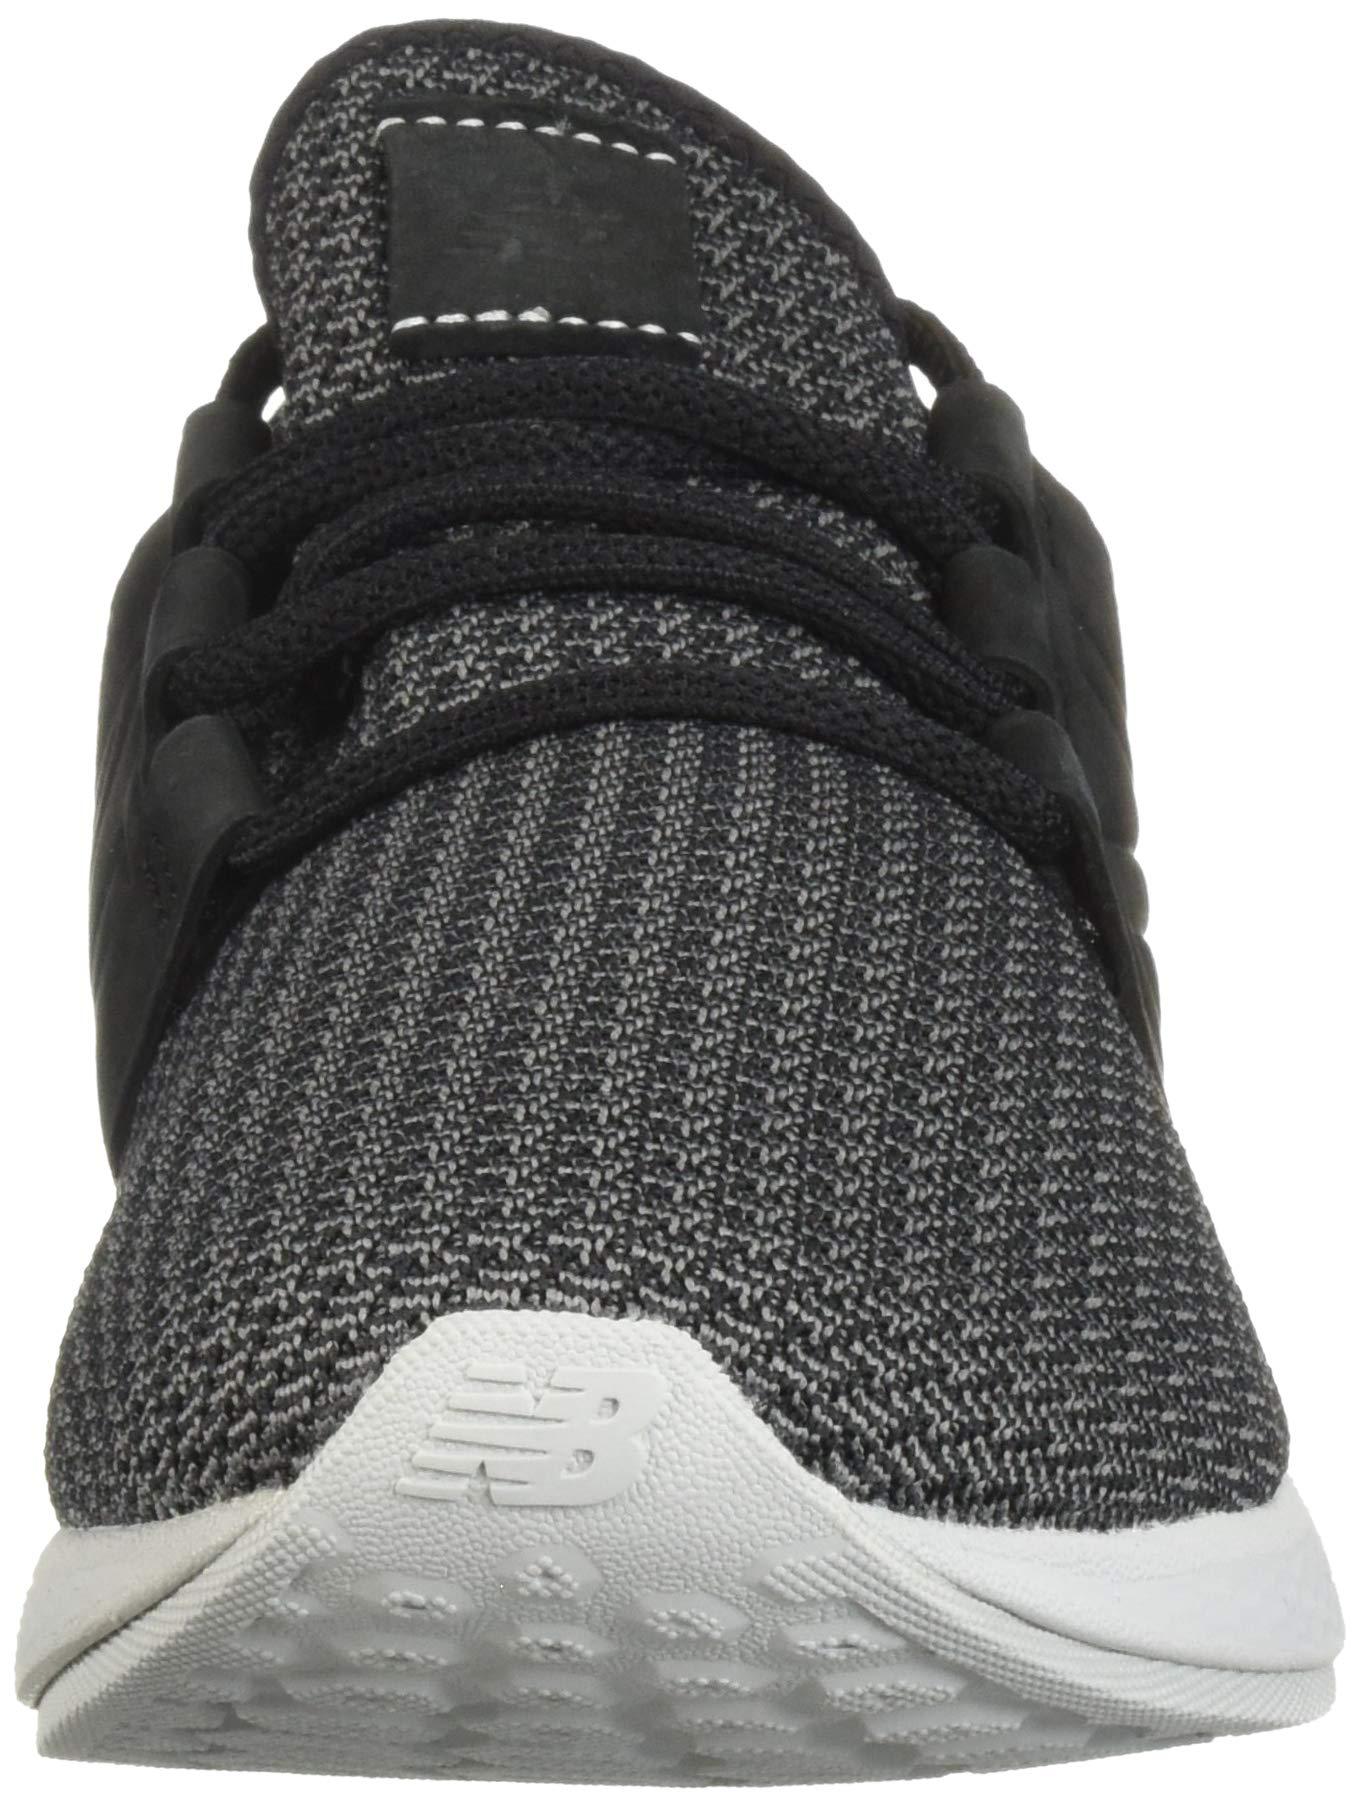 New Balance Men's Cruz V2 Fresh Foam Running Shoe, black/castlerock/nubuck, 7 D US by New Balance (Image #4)